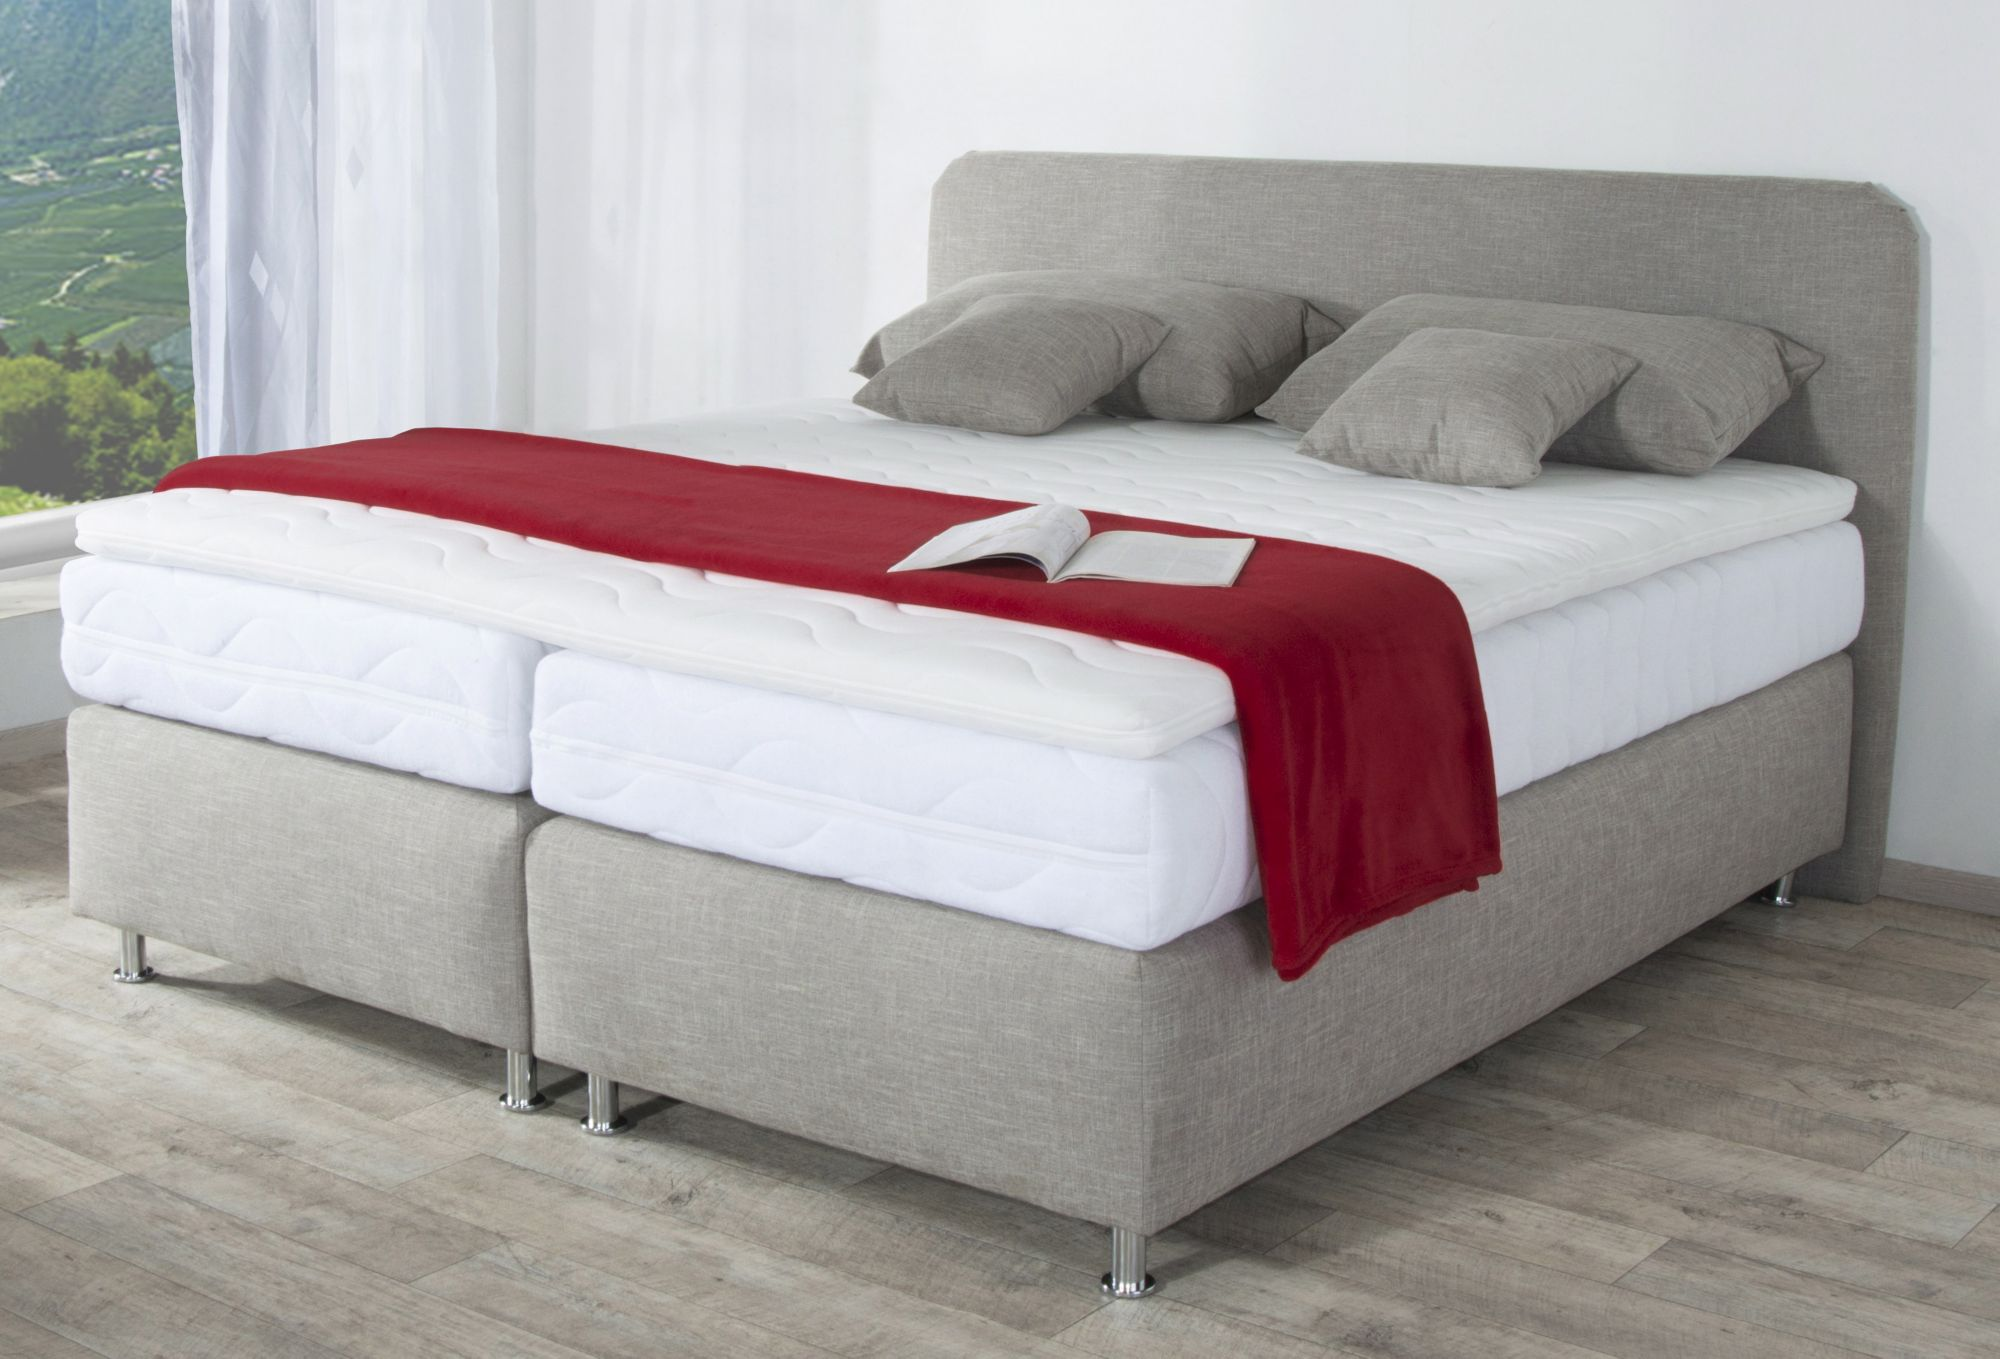 westfalia polsterbetten boxspringbett inkl kaltschaum topper schwab versand betten. Black Bedroom Furniture Sets. Home Design Ideas